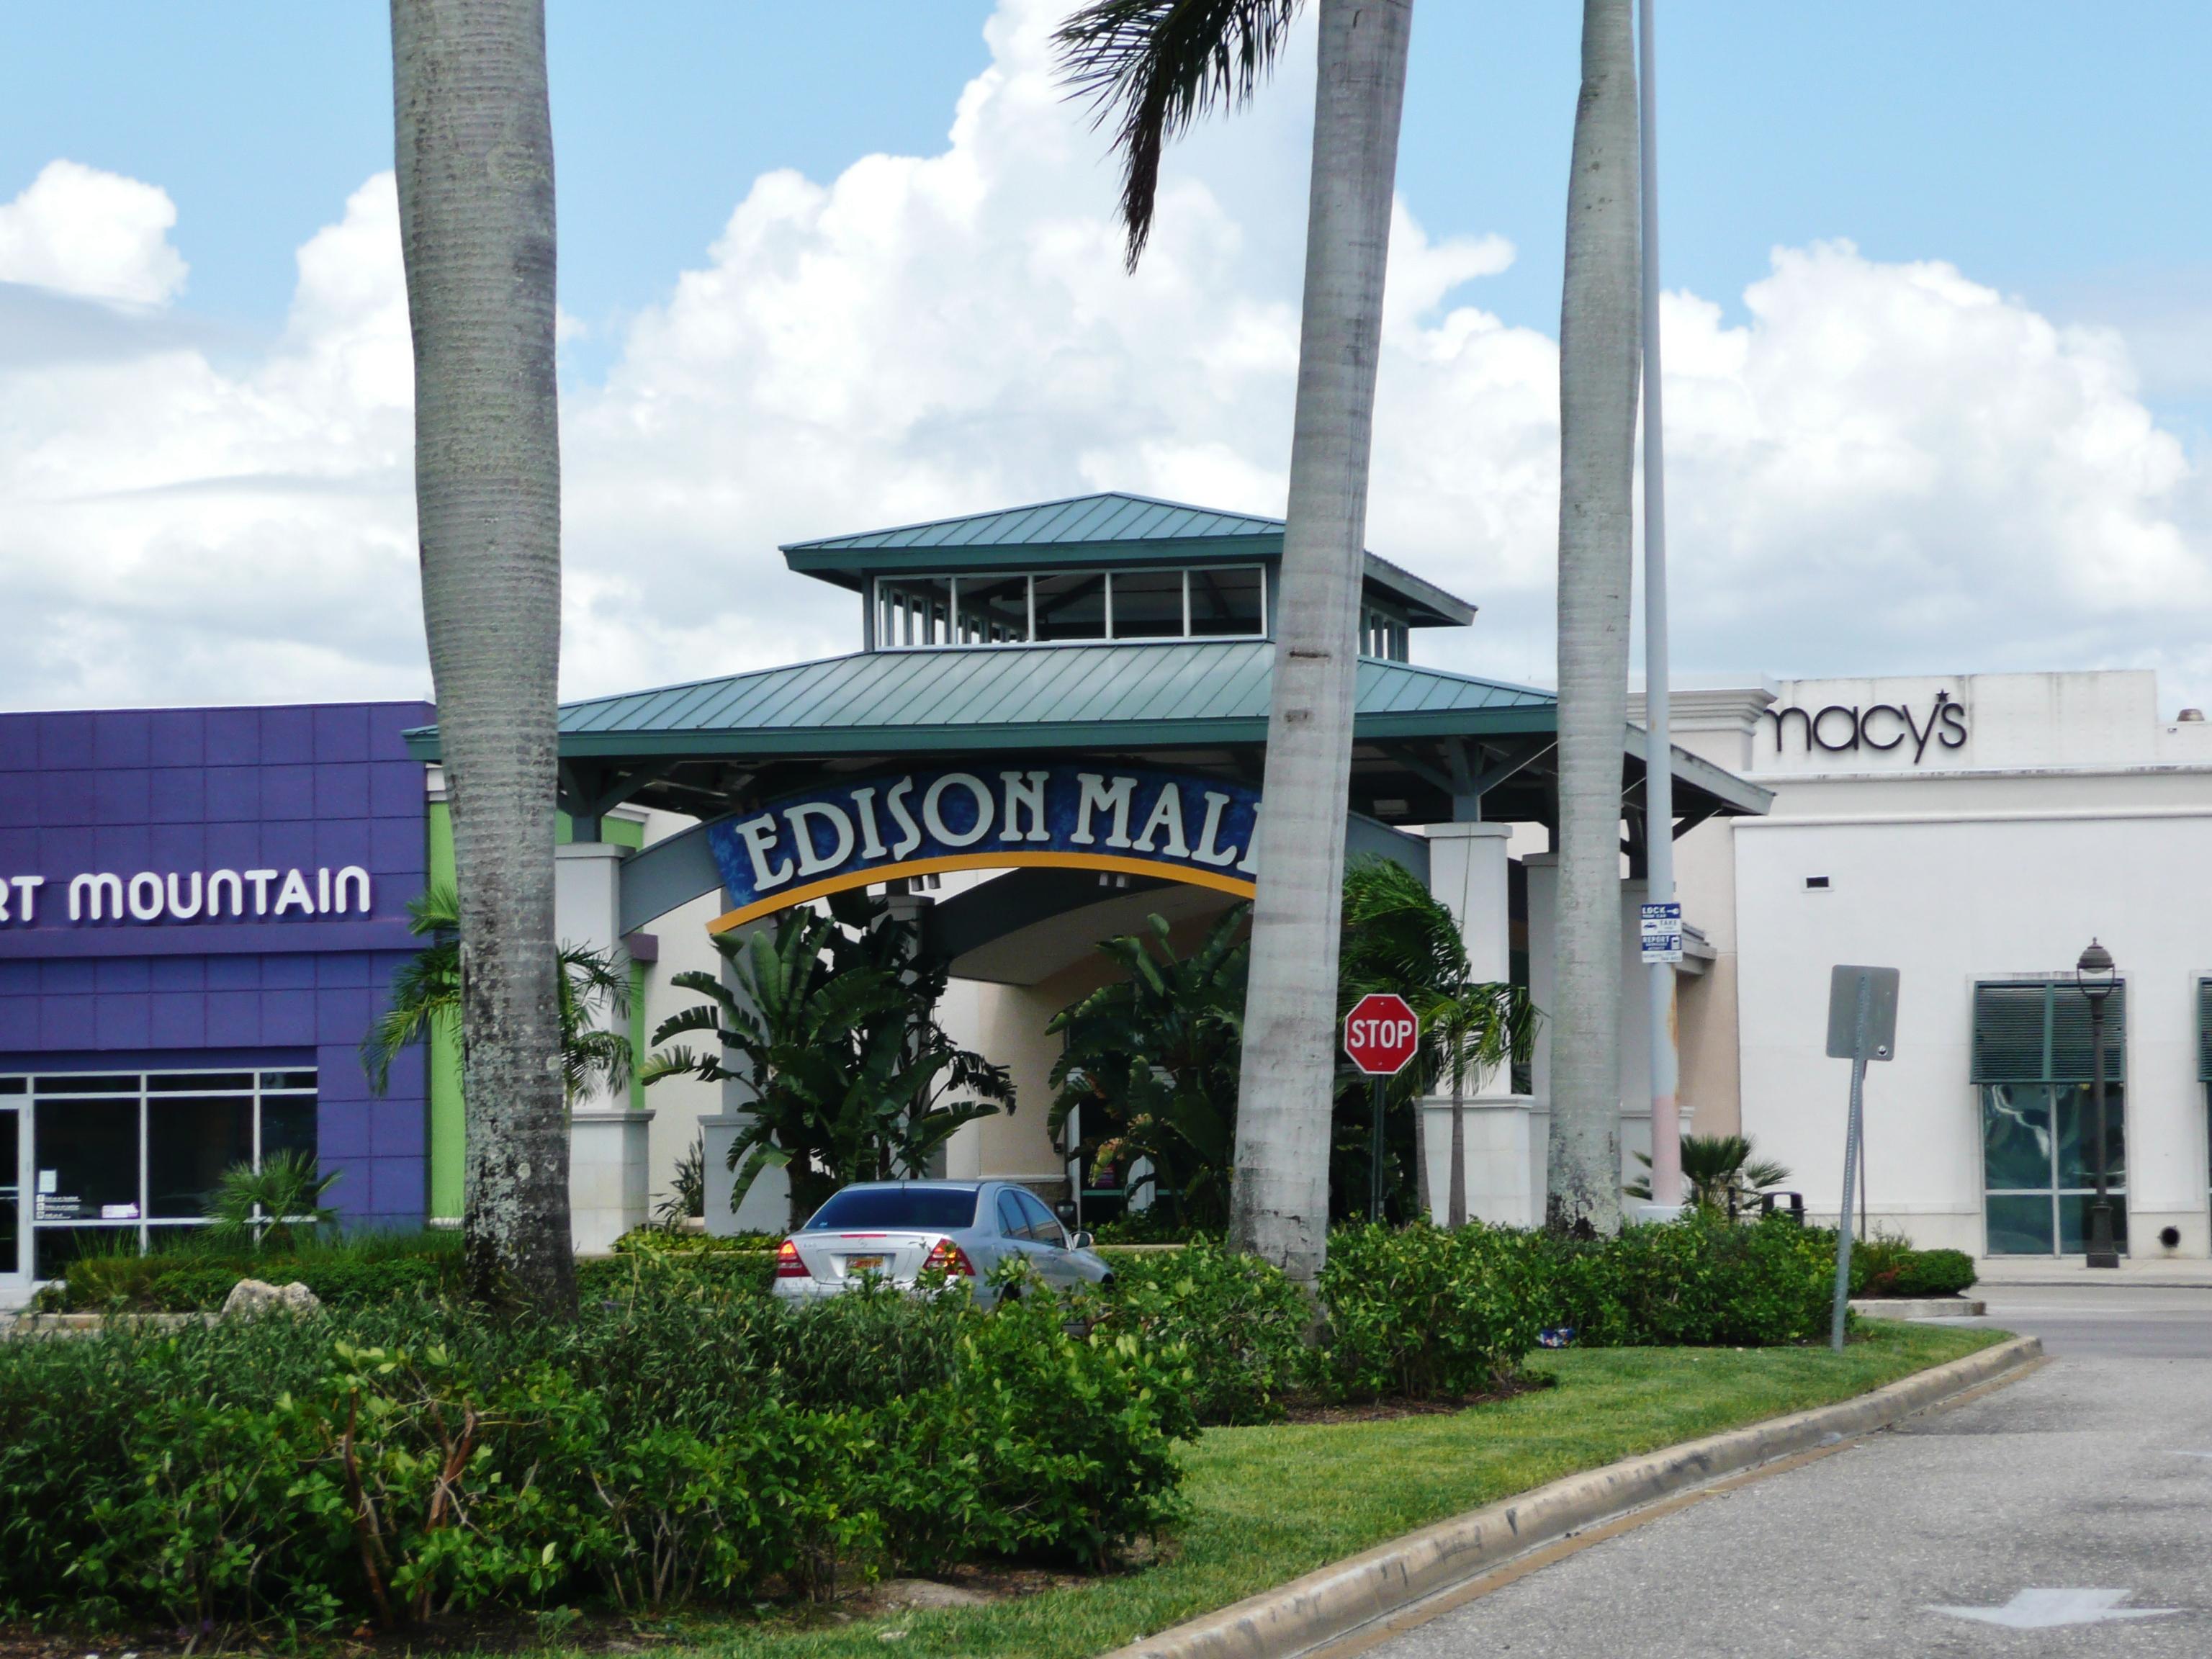 Edsion Mall